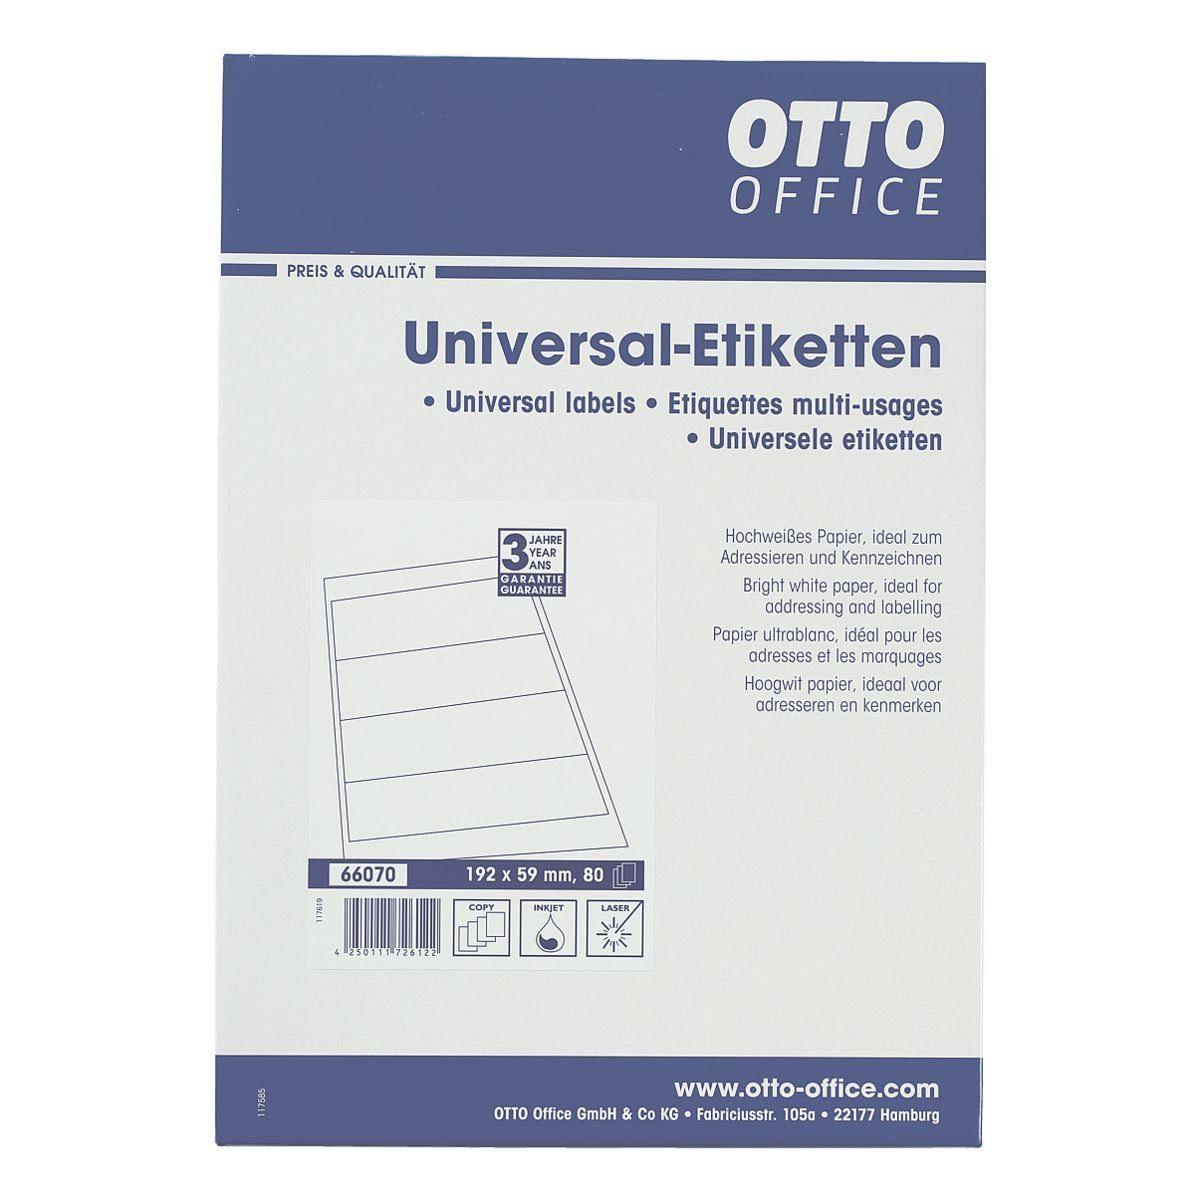 OTTO Office Standard Selbstklebende Ordnerrücken-Etiketten